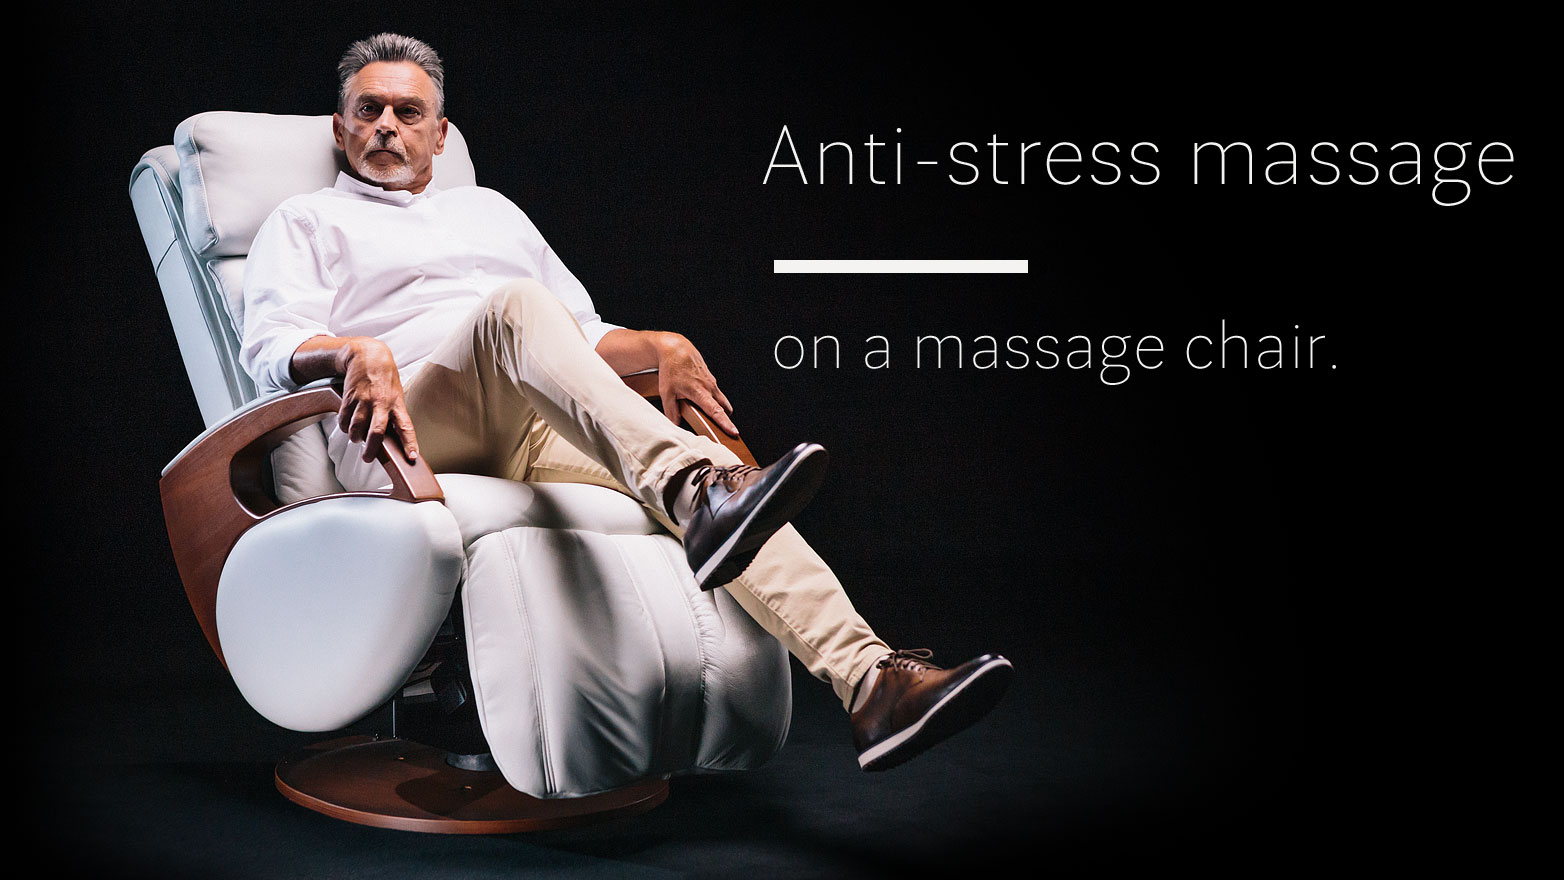 Chronic stress and massage chairs